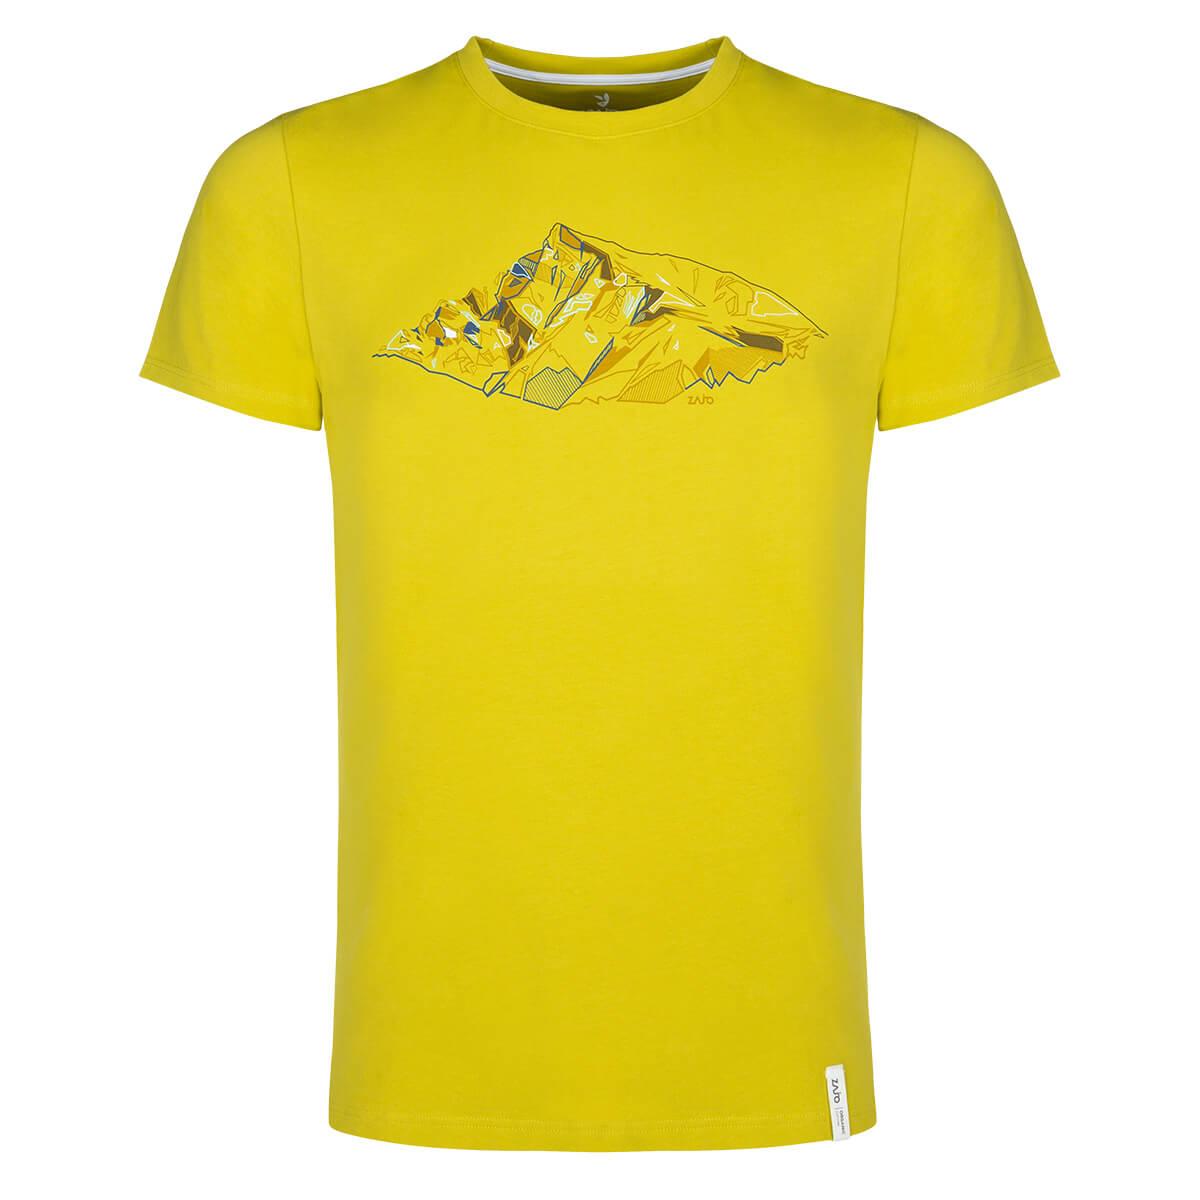 ZAJO Bormio T-Shirt SS pánske tričko Citronelle Peak - veľkosť M